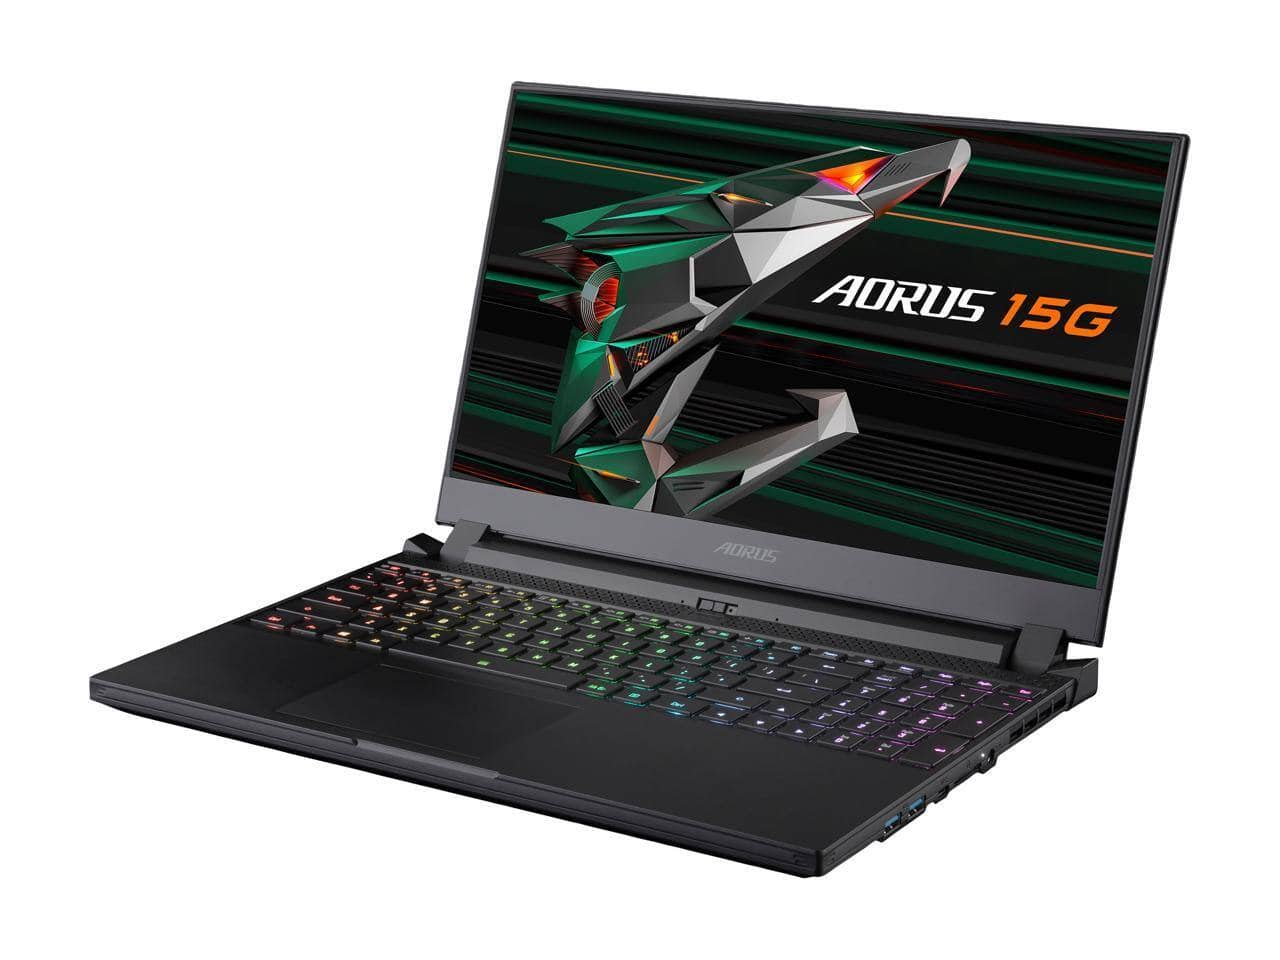 "AORUS 15G - 15.6"" 240 Hz IPS - Intel Core i7-10870H - NVIDIA GeForce RTX 3080 Laptop GPU 8 GB GDDR6 - 32GB Memory - 1 TB PCIe SSD - Windows 10 Home - Gaming Laptop $1999"